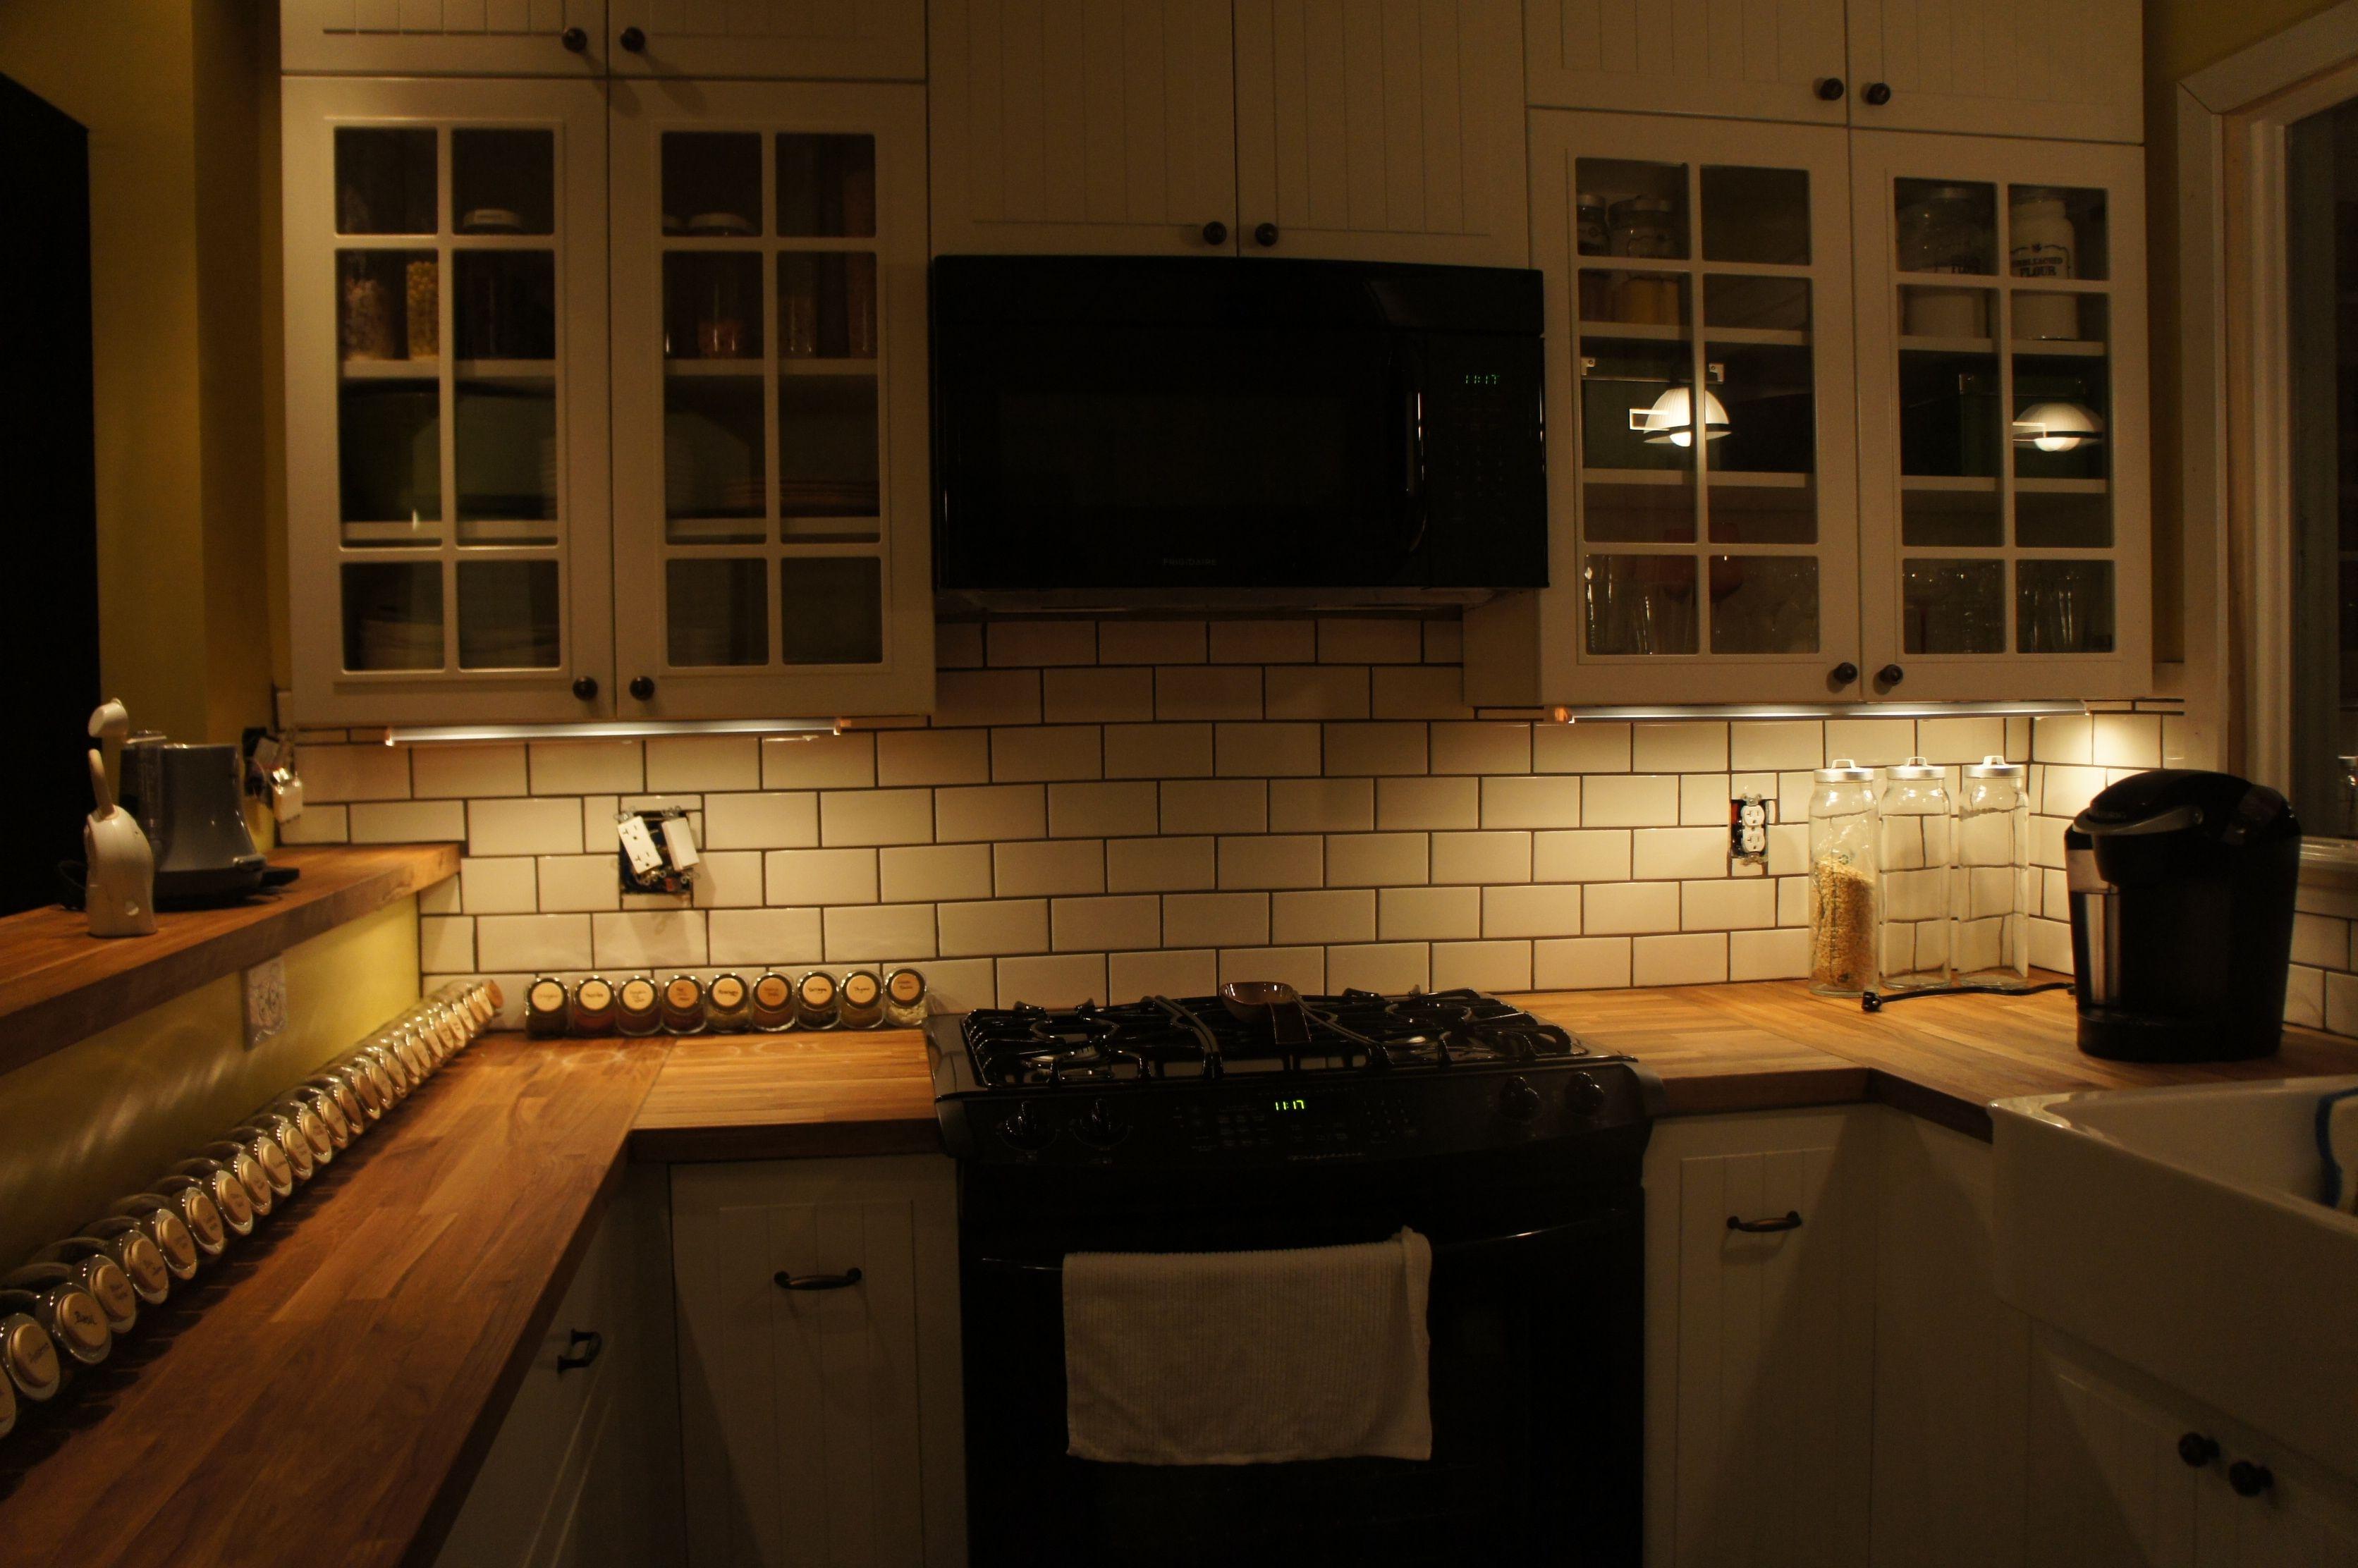 Ikea Cabinets Butcher Block Countertops Xenon Under Cabinet Lights Trendy Kitchen Tile Kitchen Layout Kitchen Designs Layout